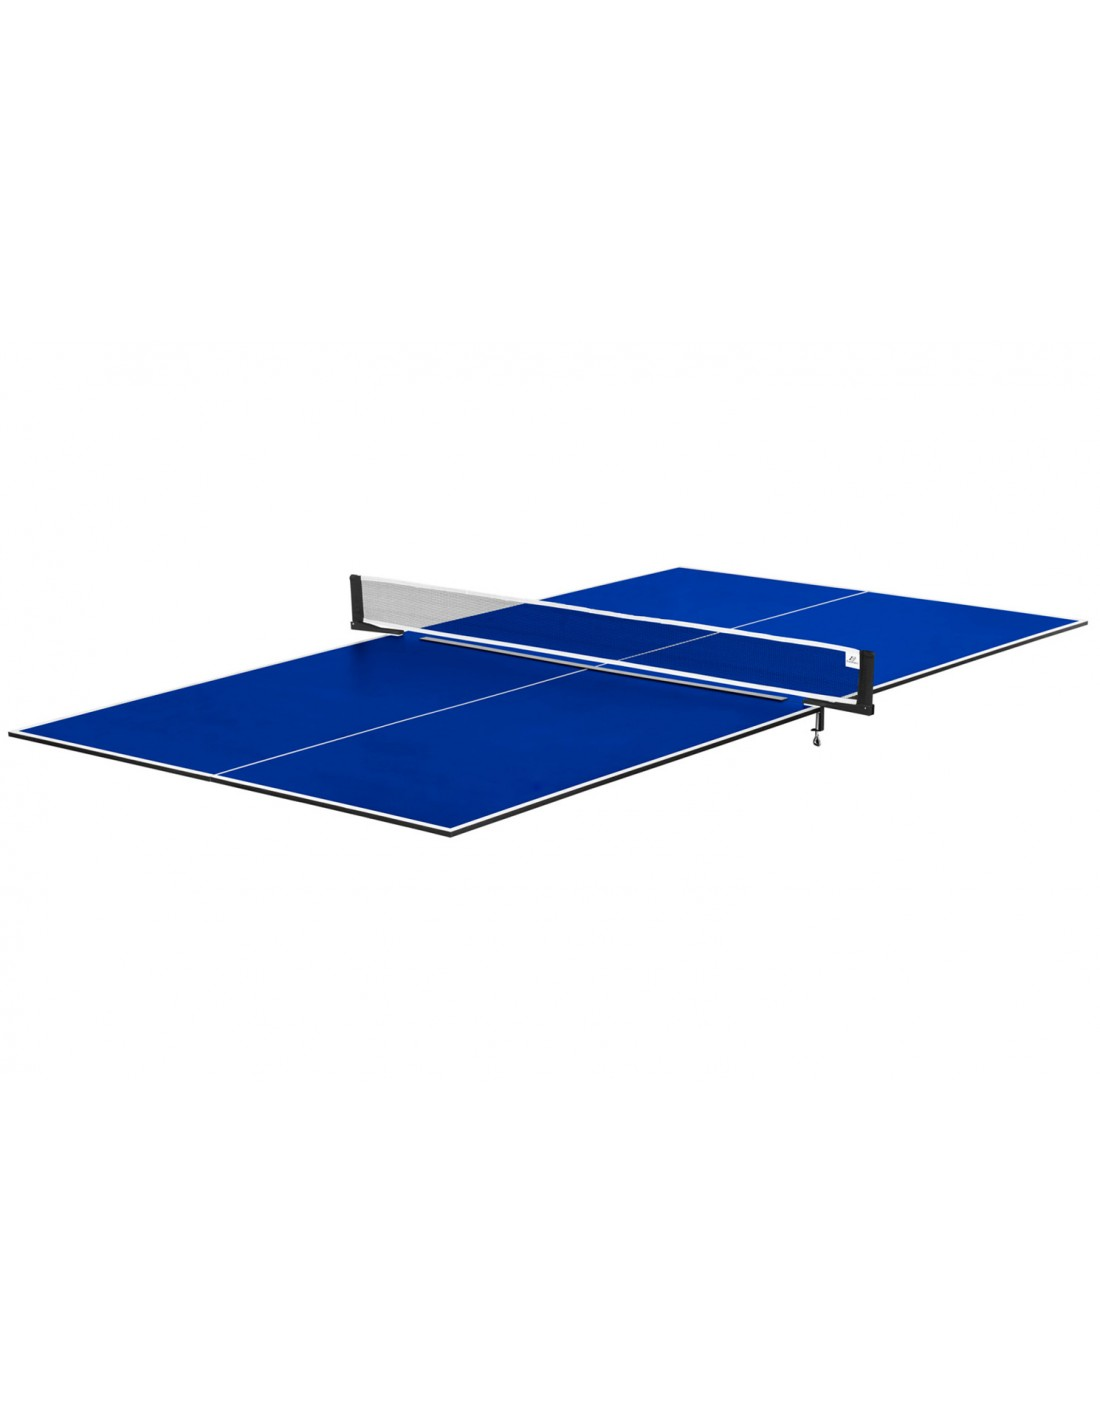 Pliable Pong De Ping De Table Table Ping Pong Pliable OkXZuPi